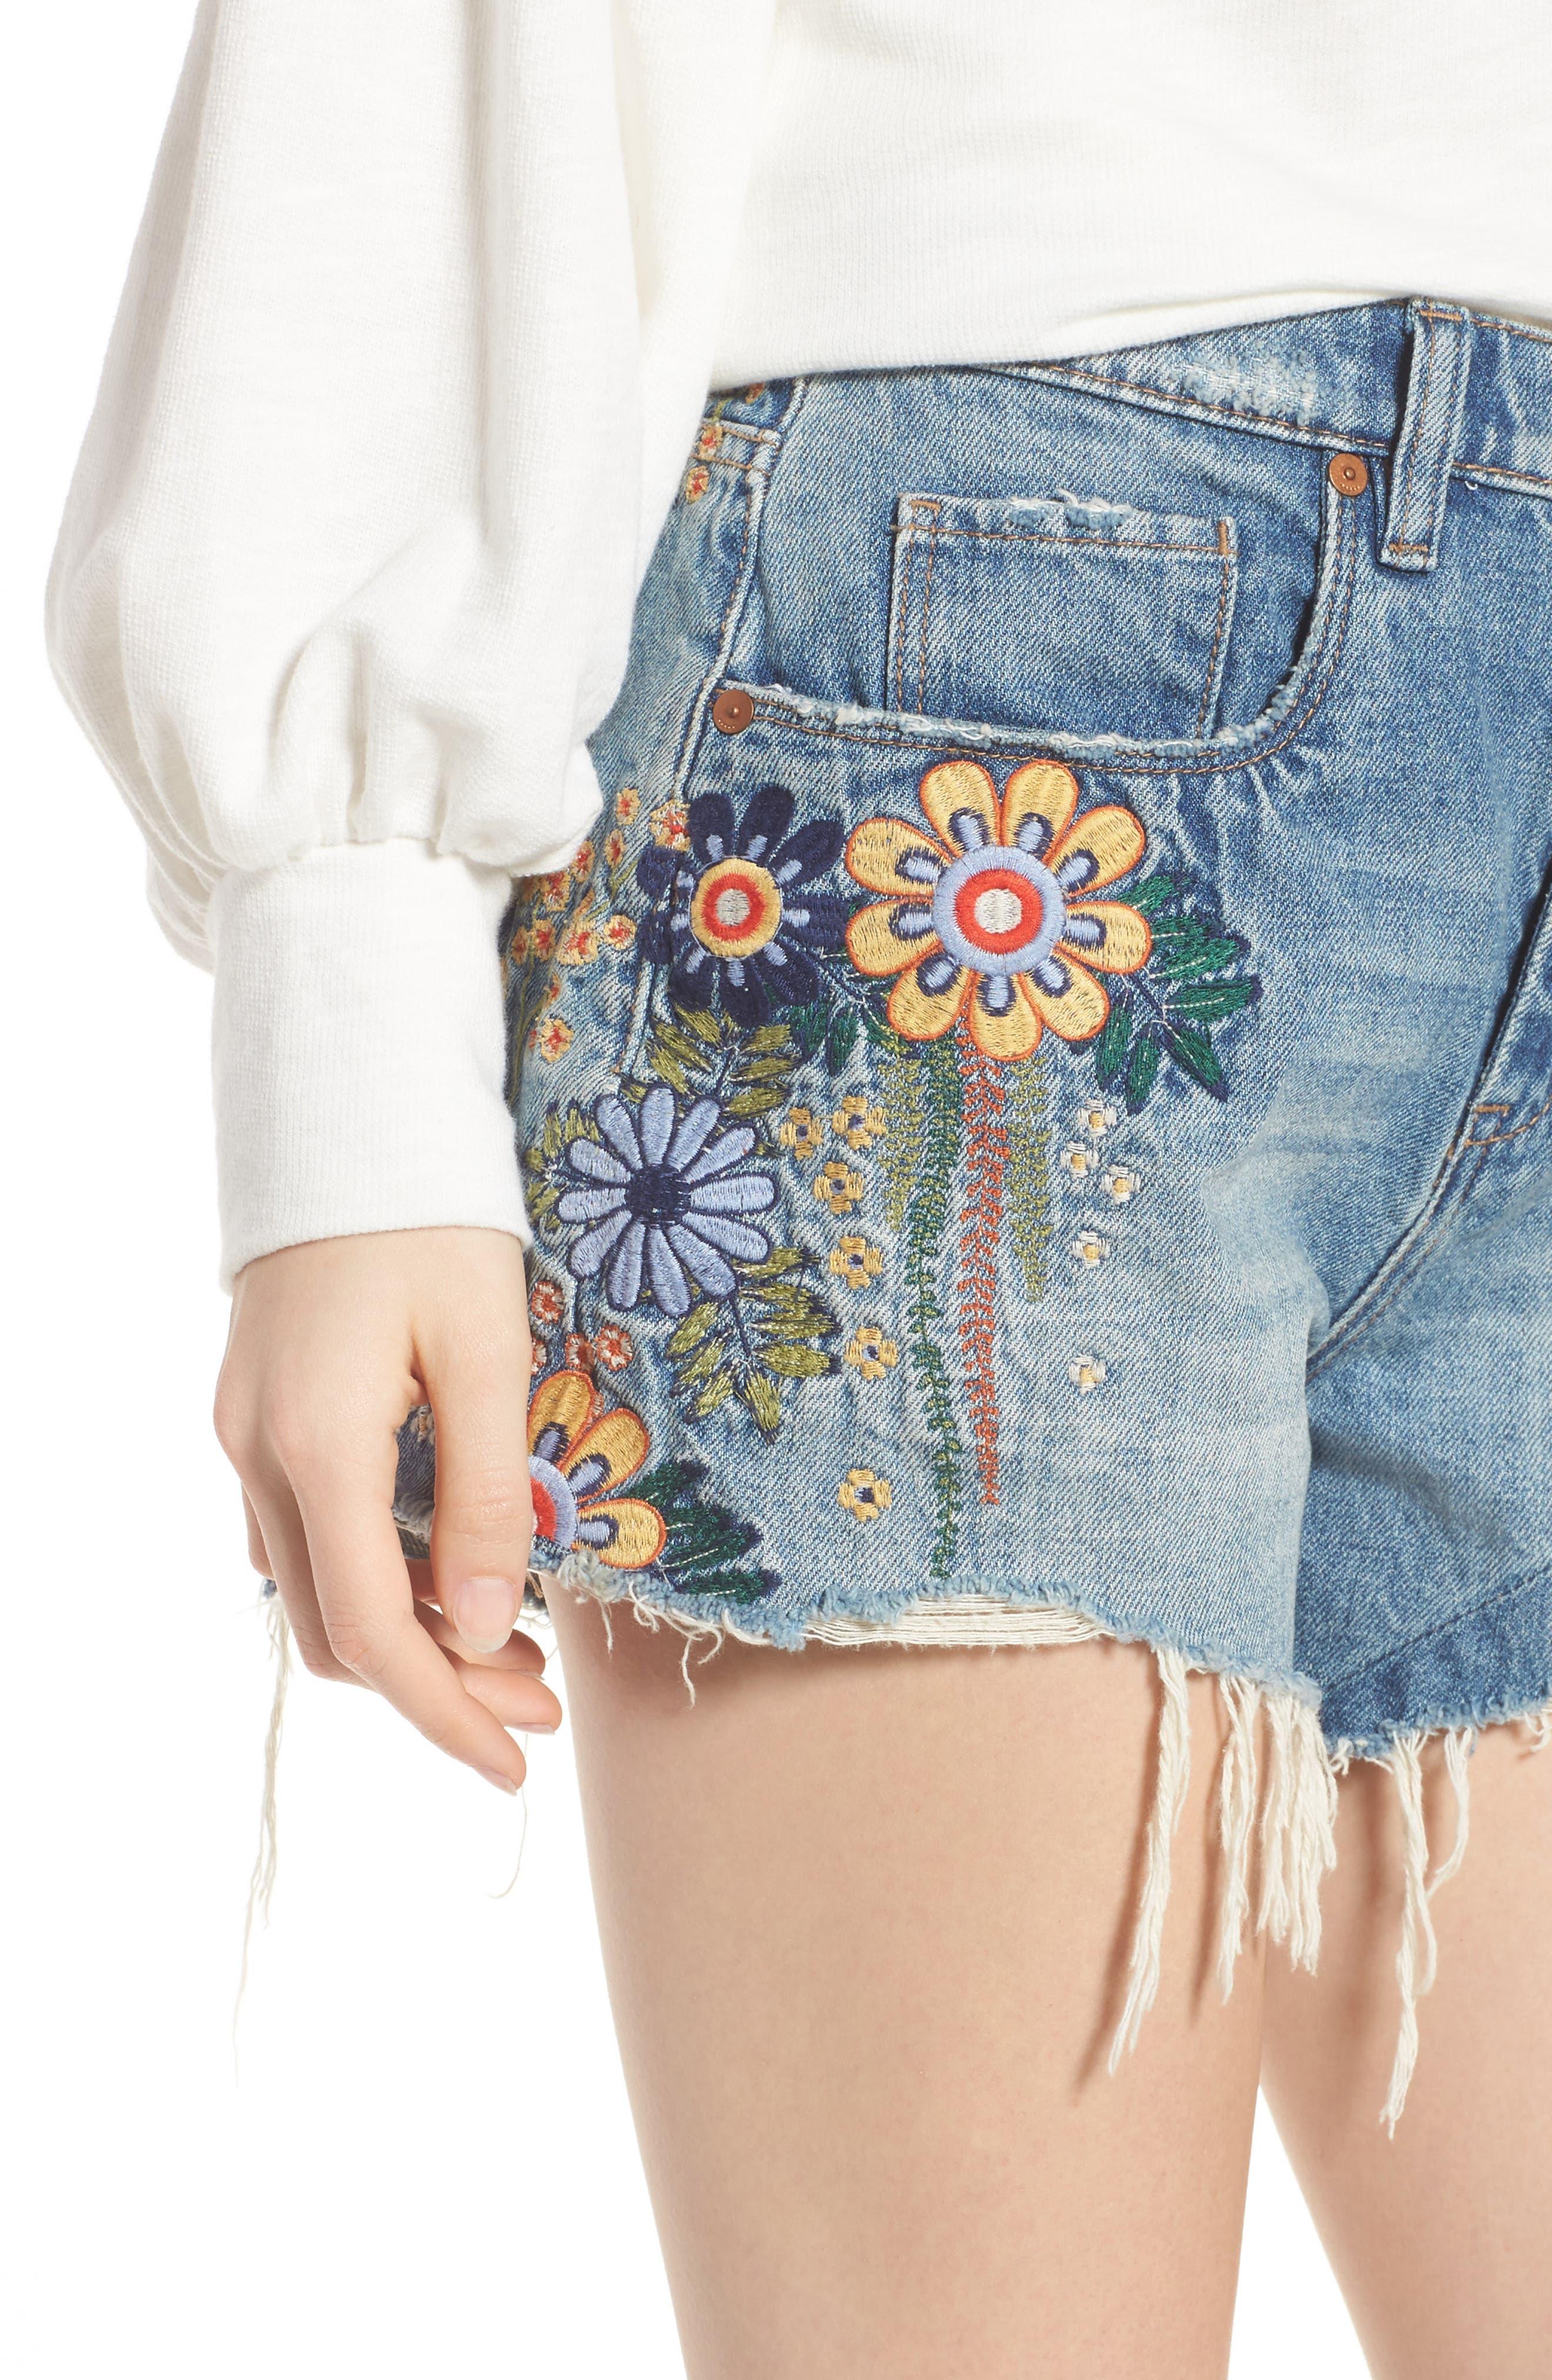 Sonic Bloom Embroidered Denim Shorts,                             Alternate thumbnail 4, color,                             Blue